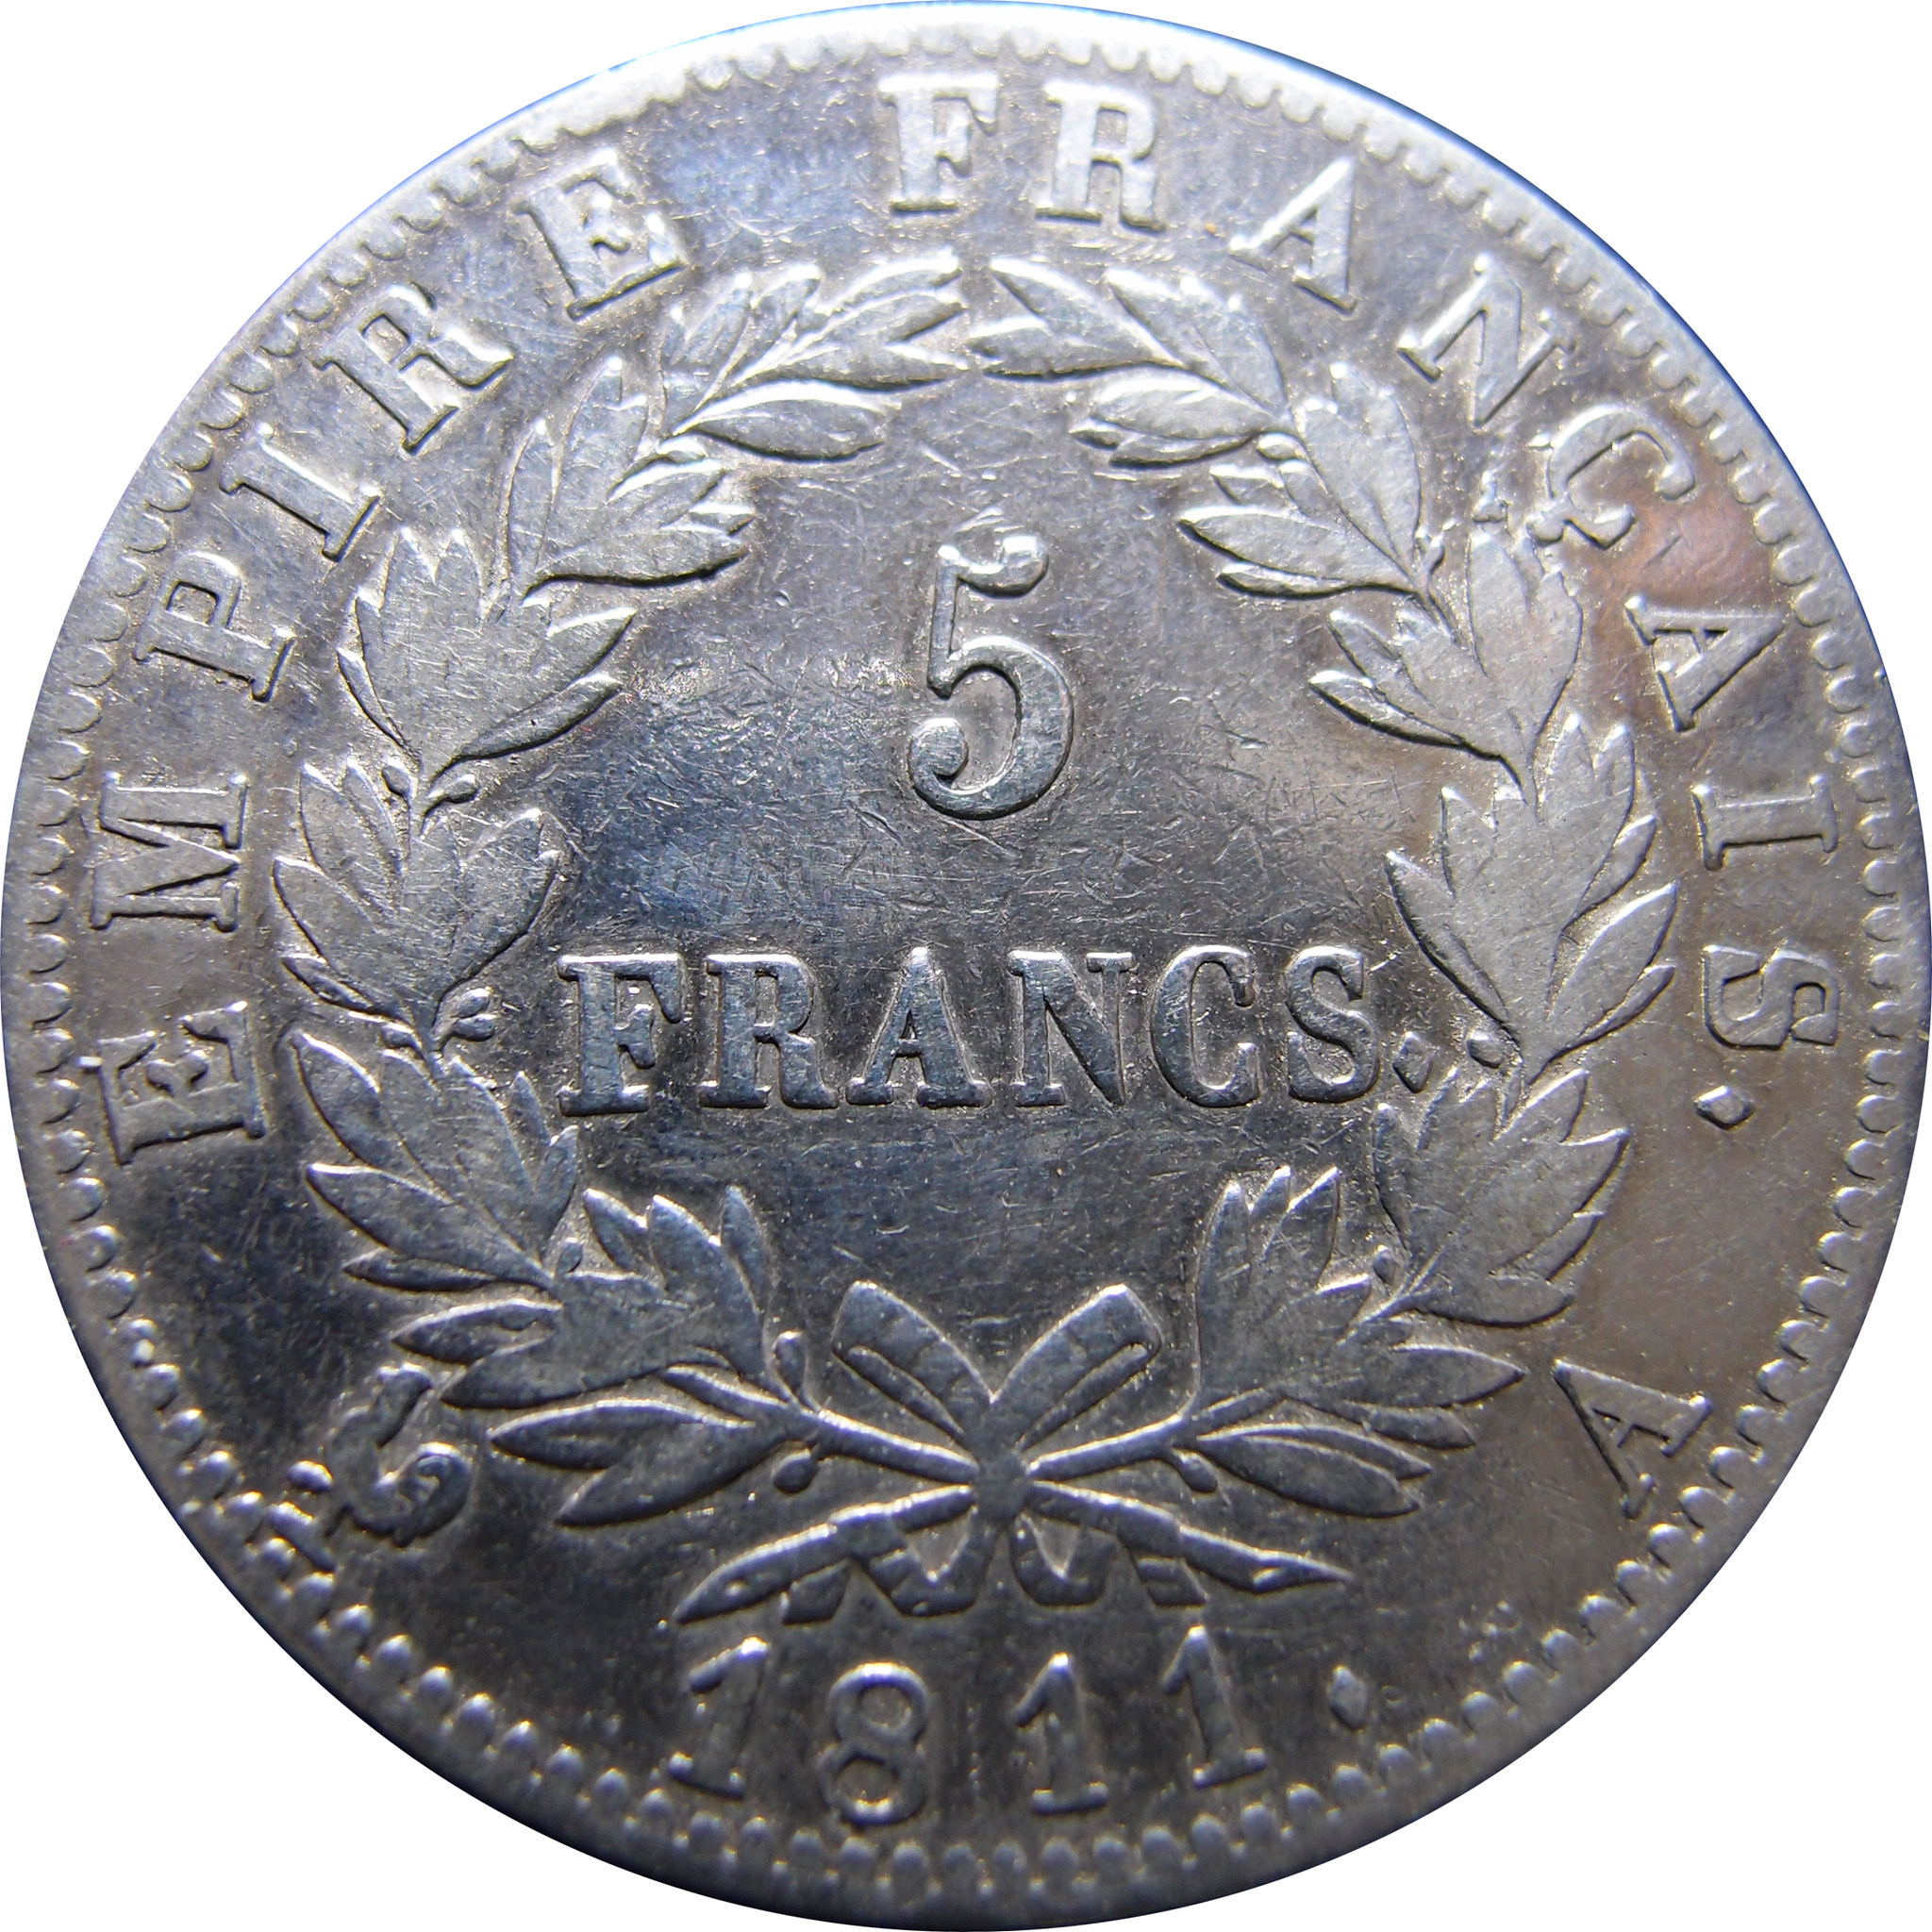 5 Francs. Francia. 1811. París 8756934049_68f52c4494_k